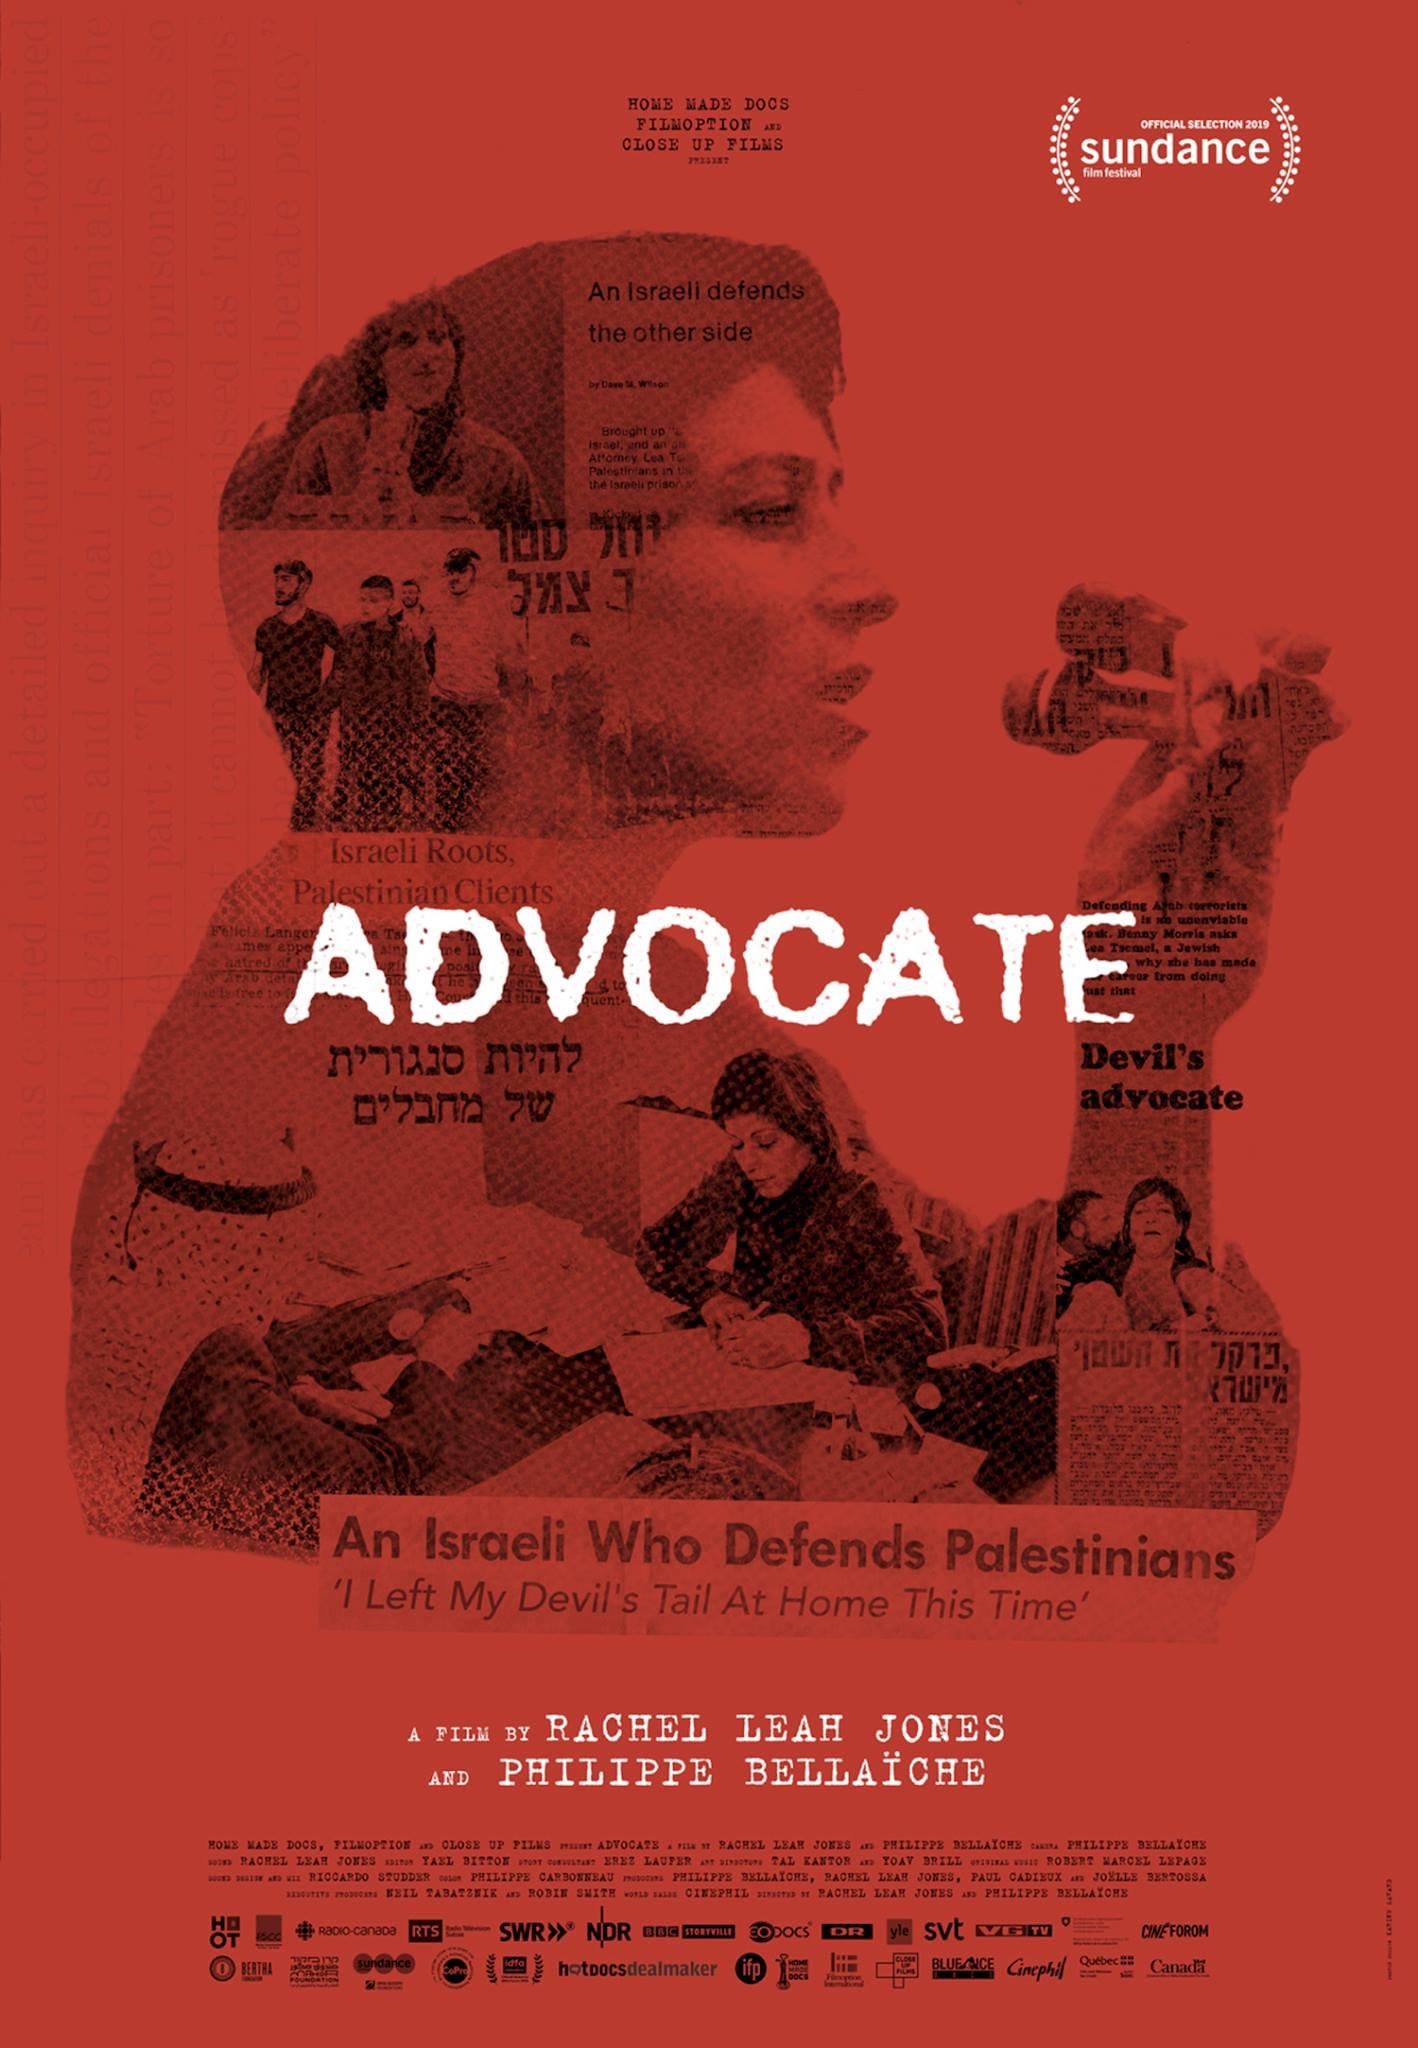 ADVOCATE Release Poster